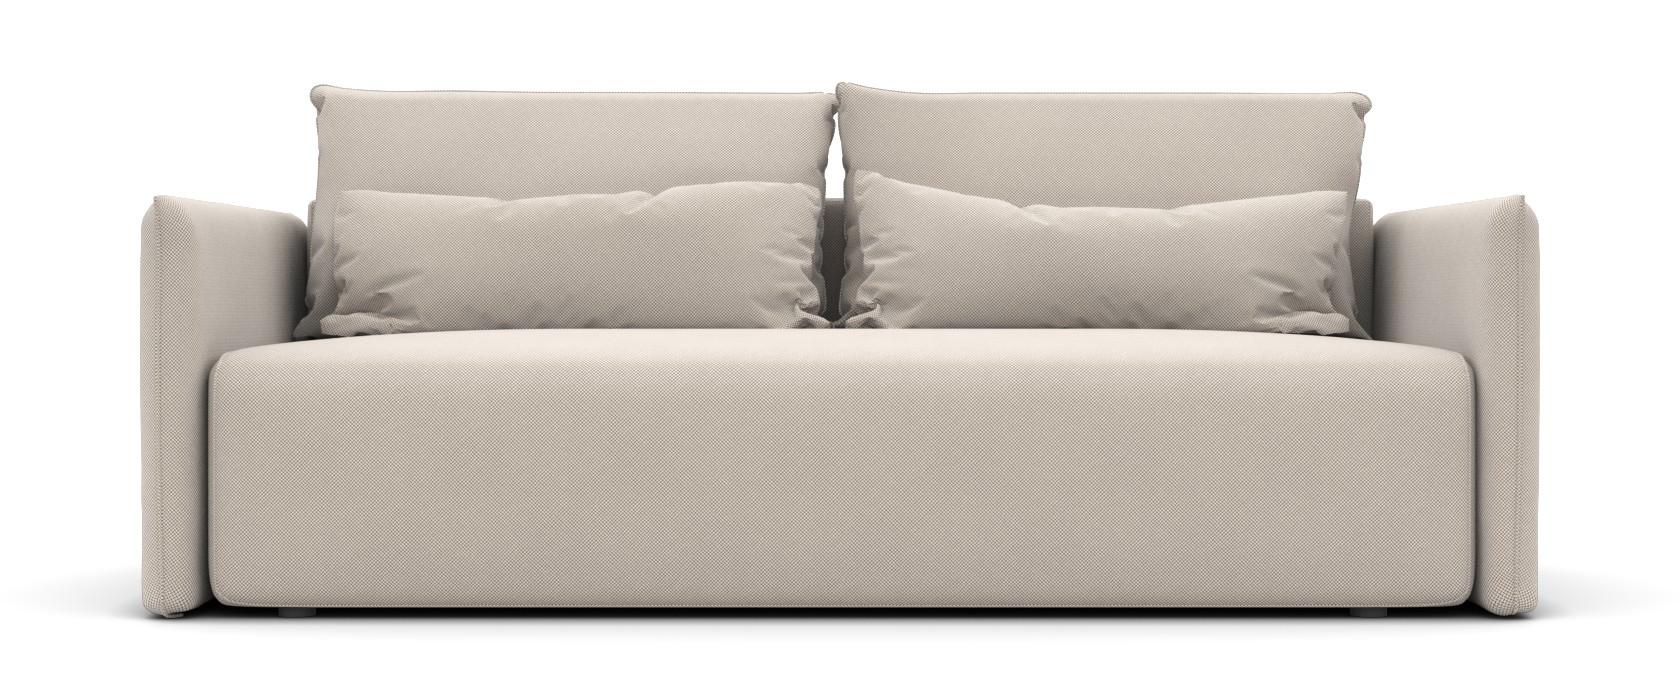 Трехместный диван Laura - Pufetto